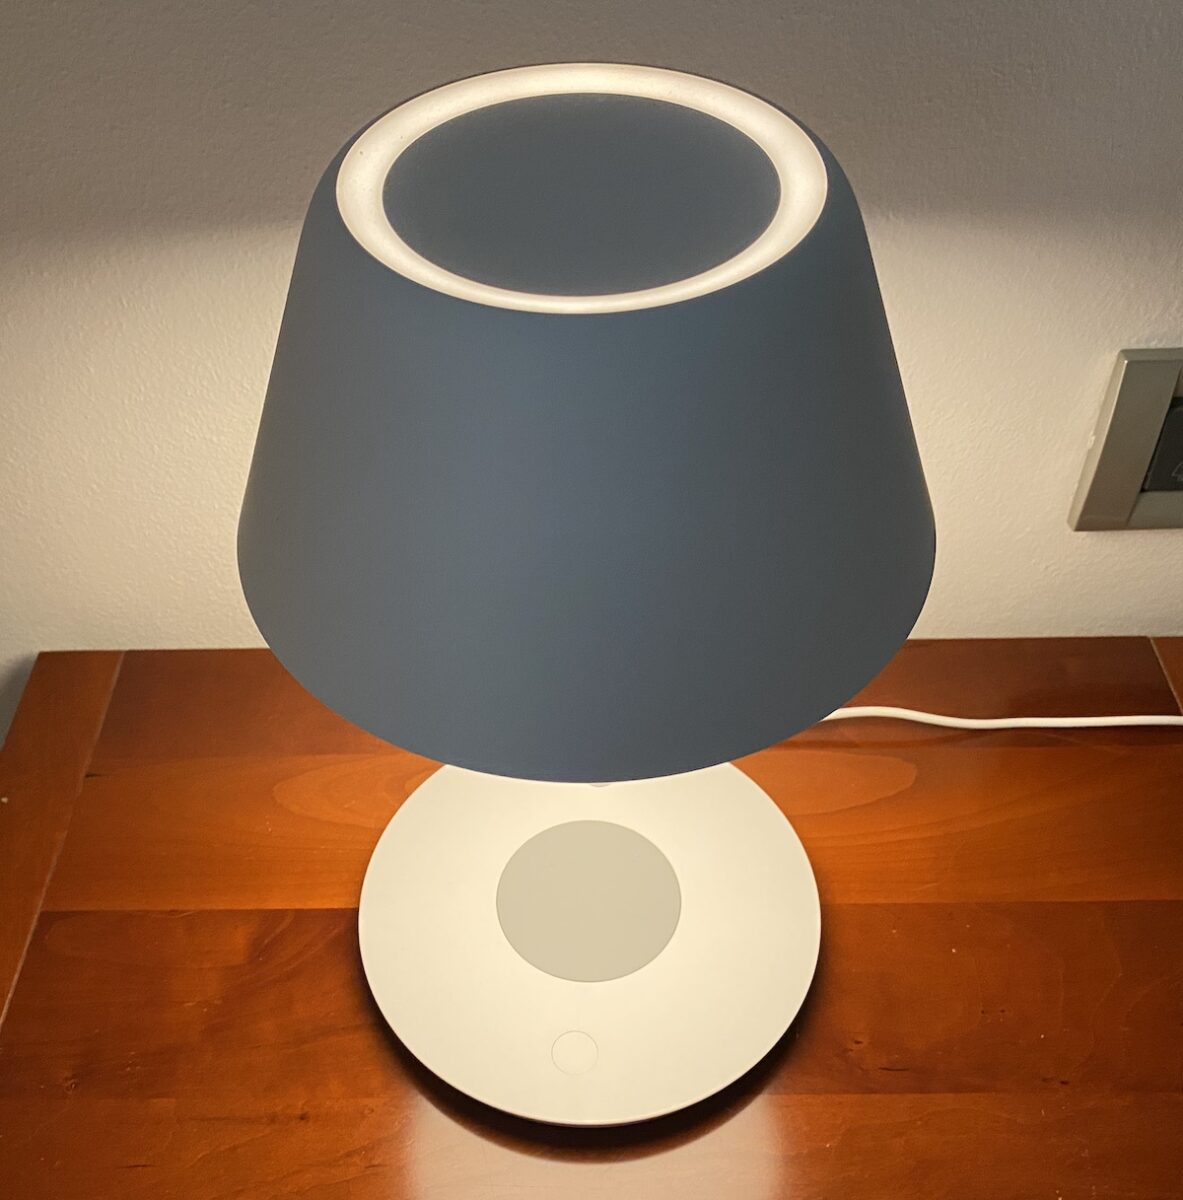 Recensione YEELIGHT YLCT03YL Pro: lampada homekit con ricarica wireless